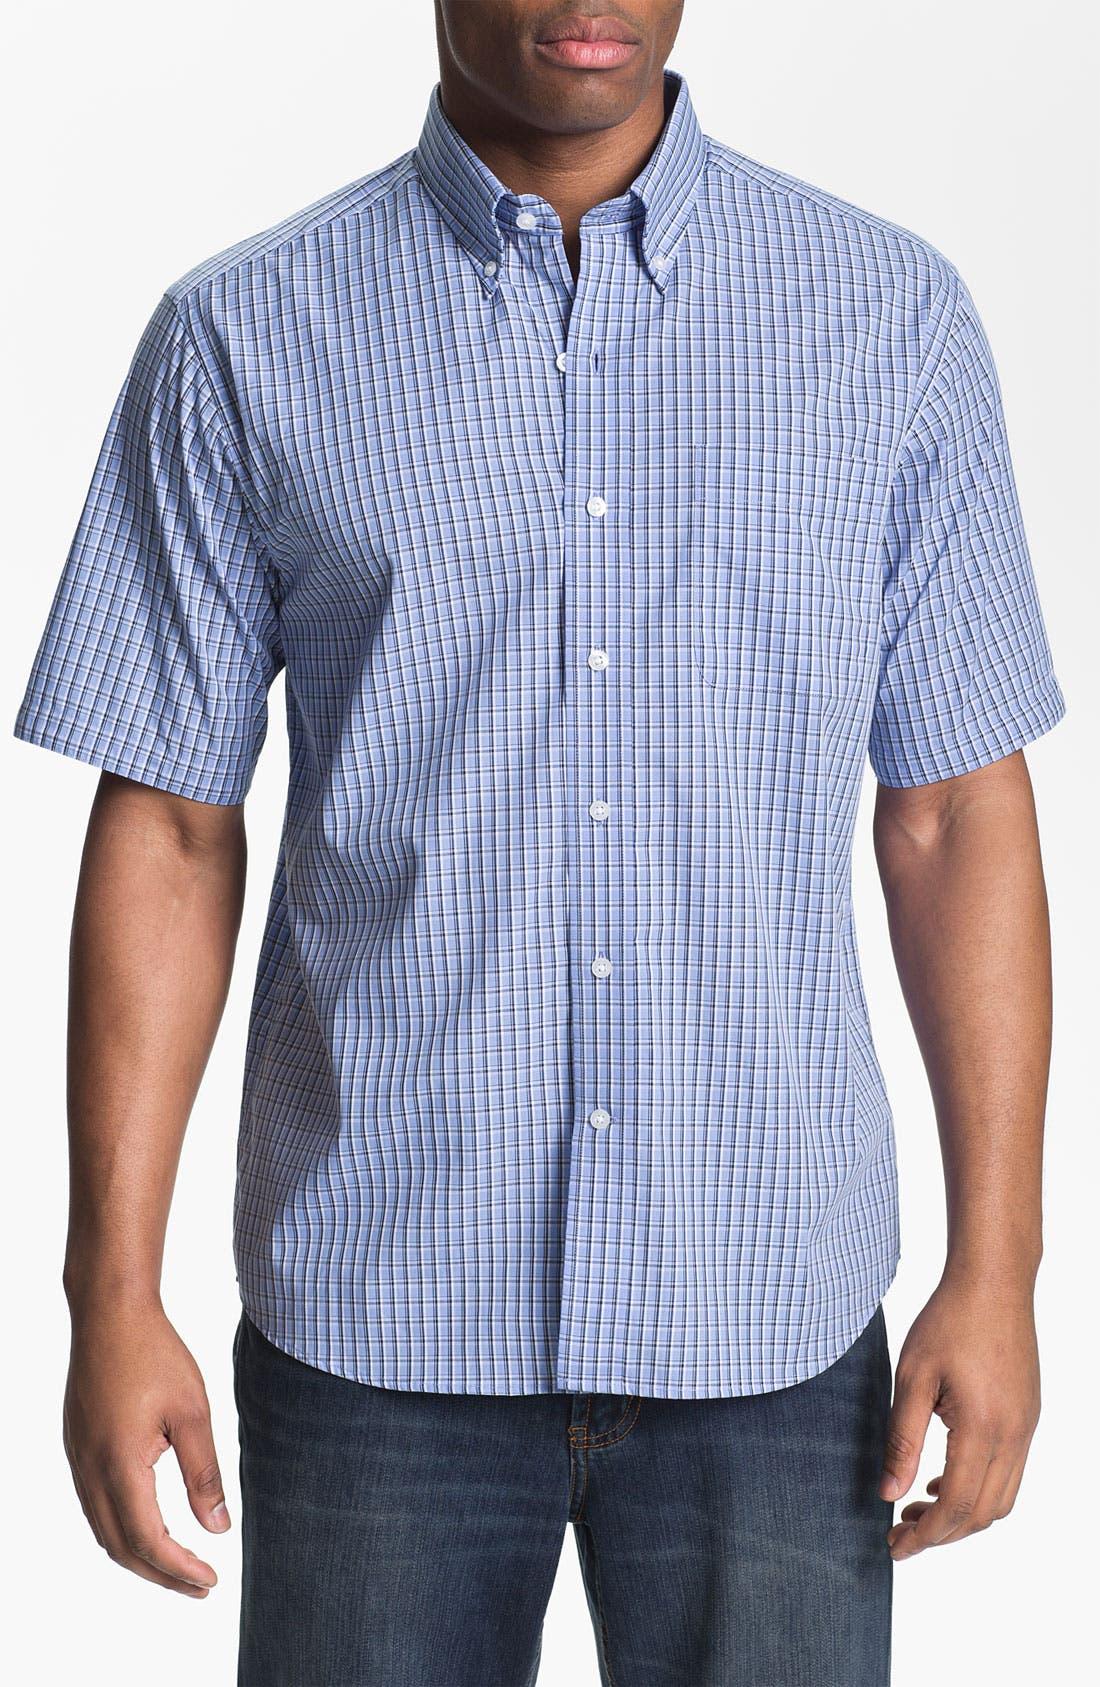 Alternate Image 1 Selected - Cutter & Buck 'Sunset Hill' Check Sport Shirt (Big & Tall) (Online Only)